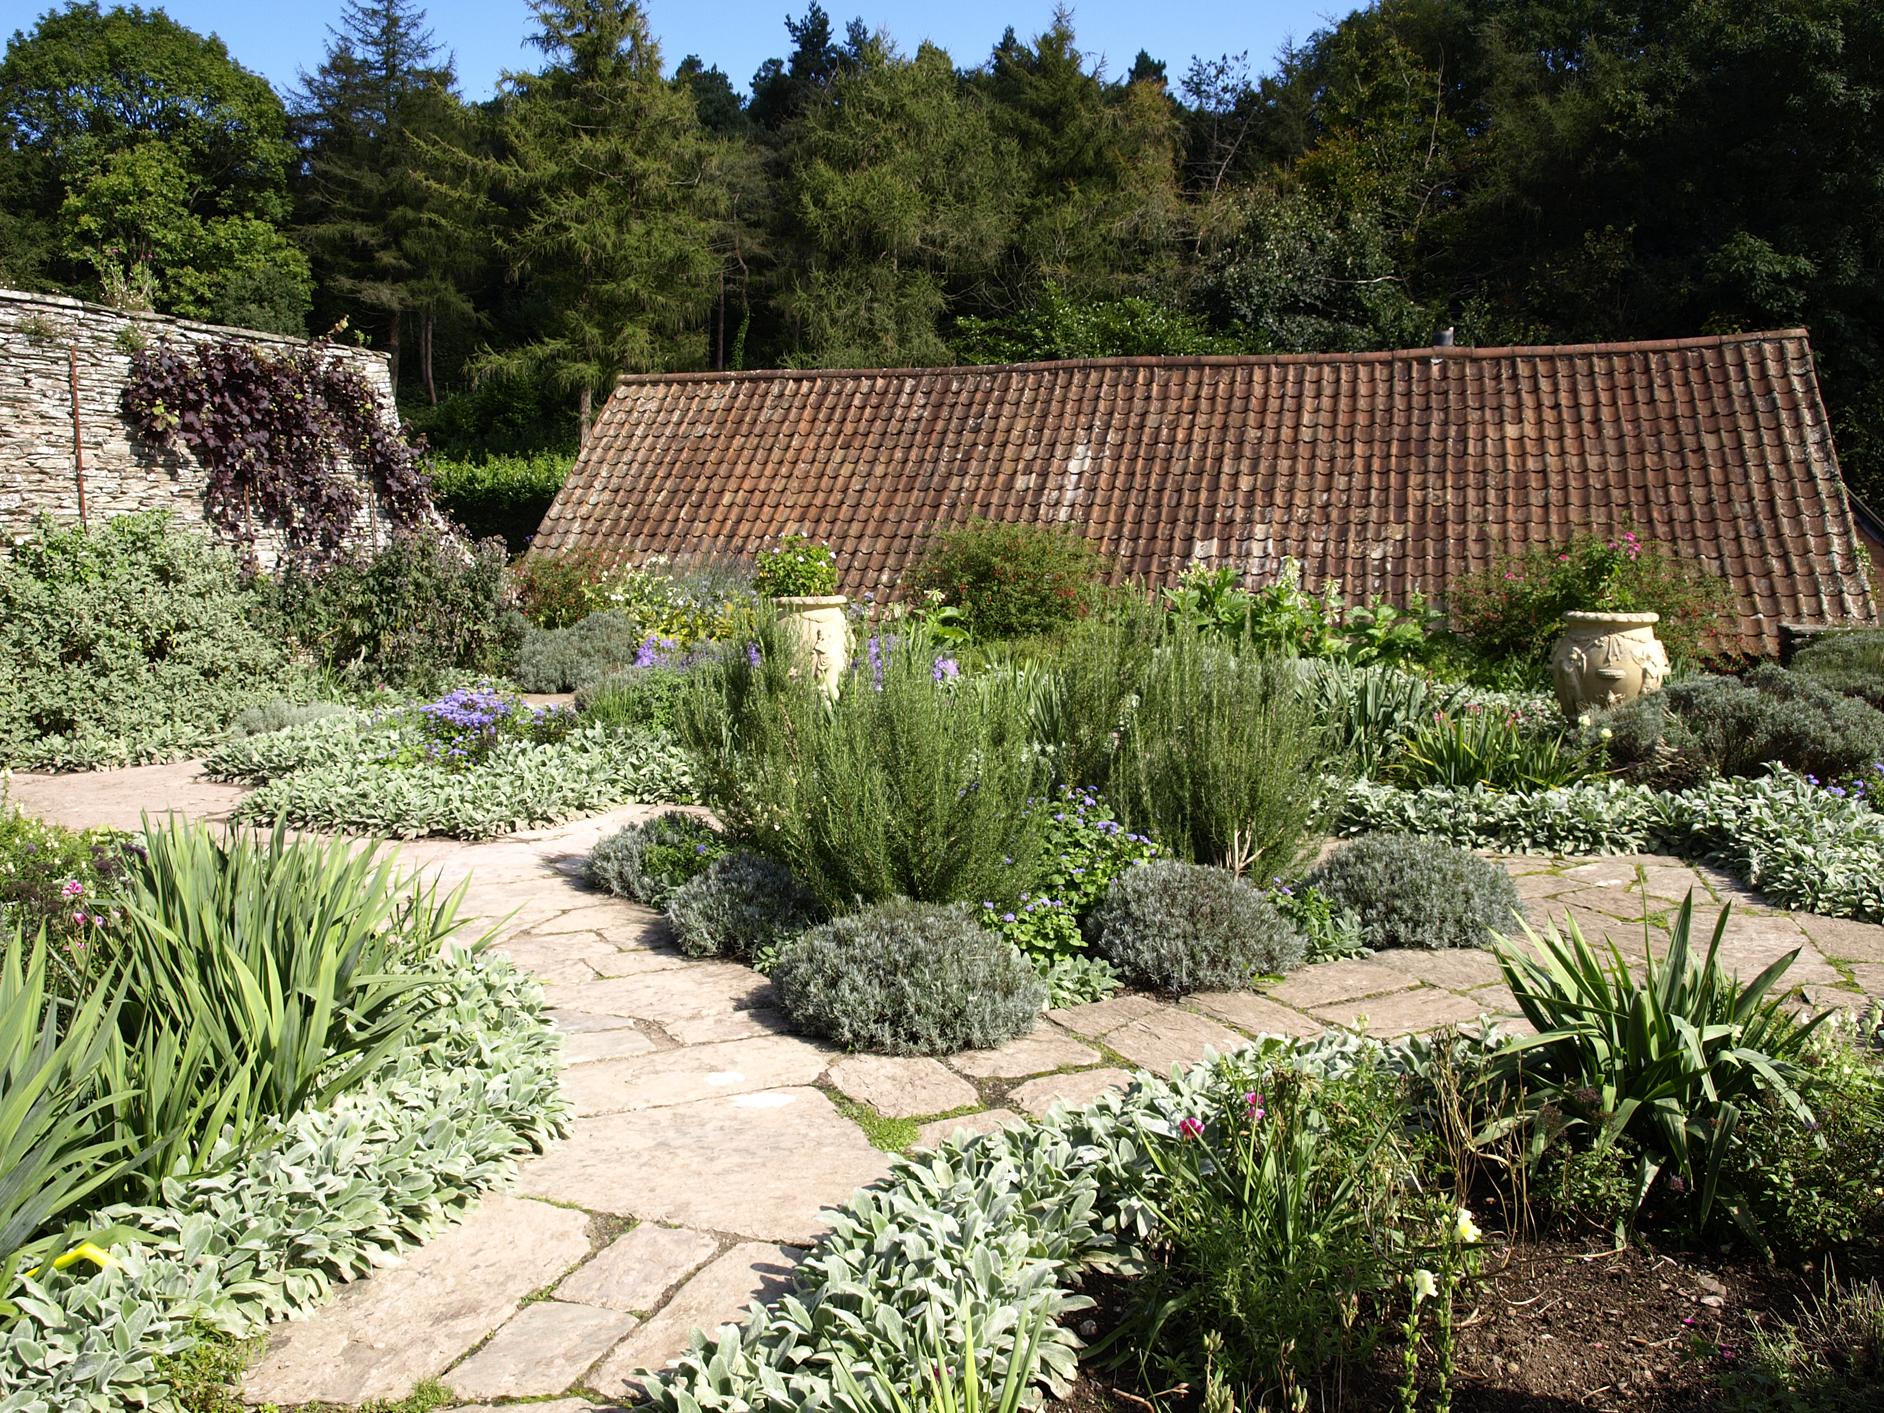 Gertrude Jekyll Gardens >> File:Hestercombe Dutch Garden3.jpg - Wikimedia Commons